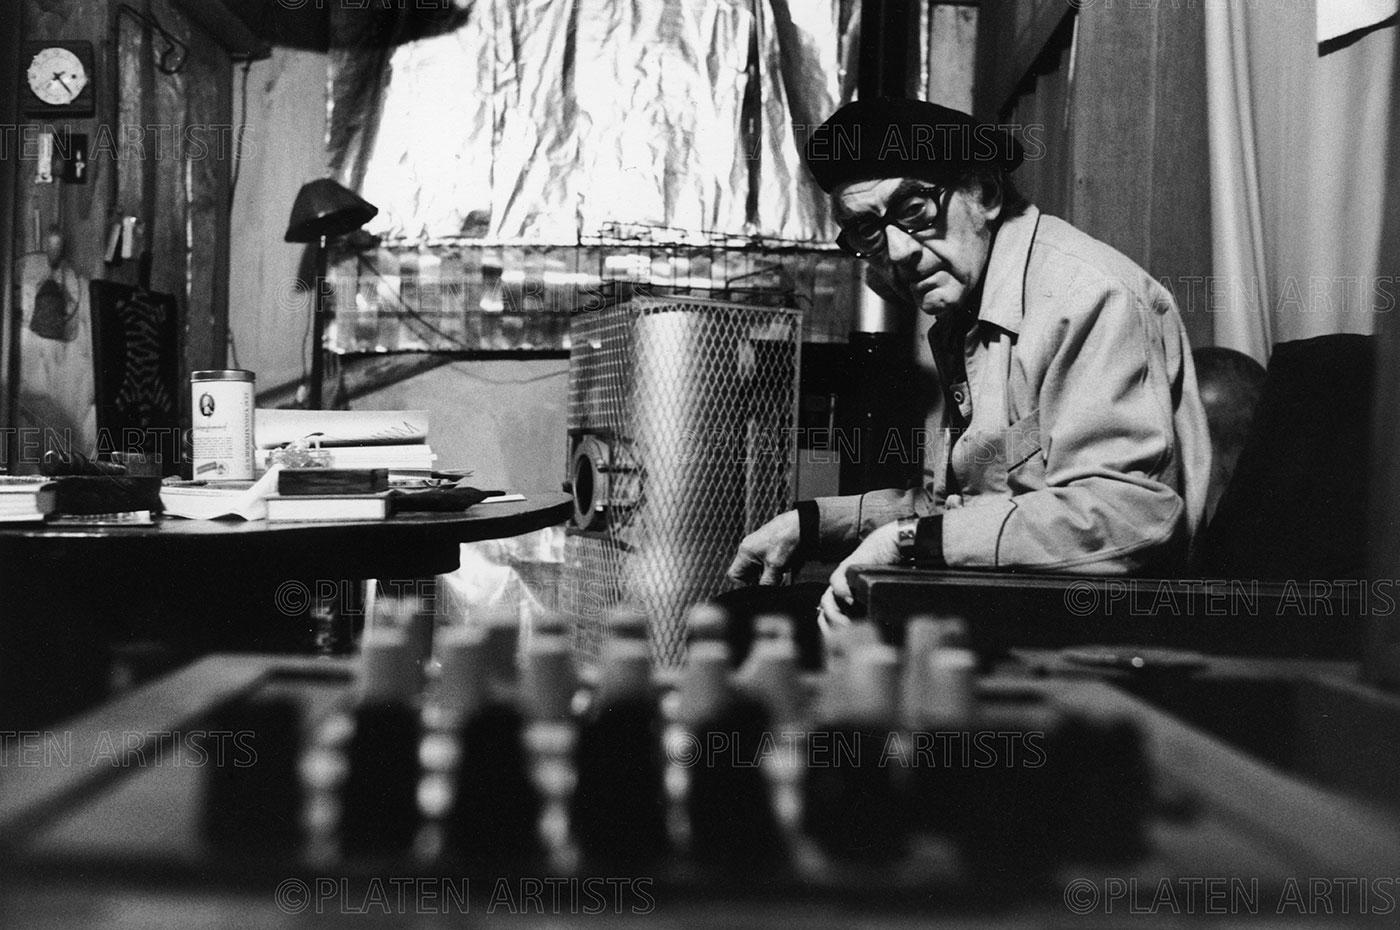 Man Ray, Guru hinter Schachbrett , Paris, 1974